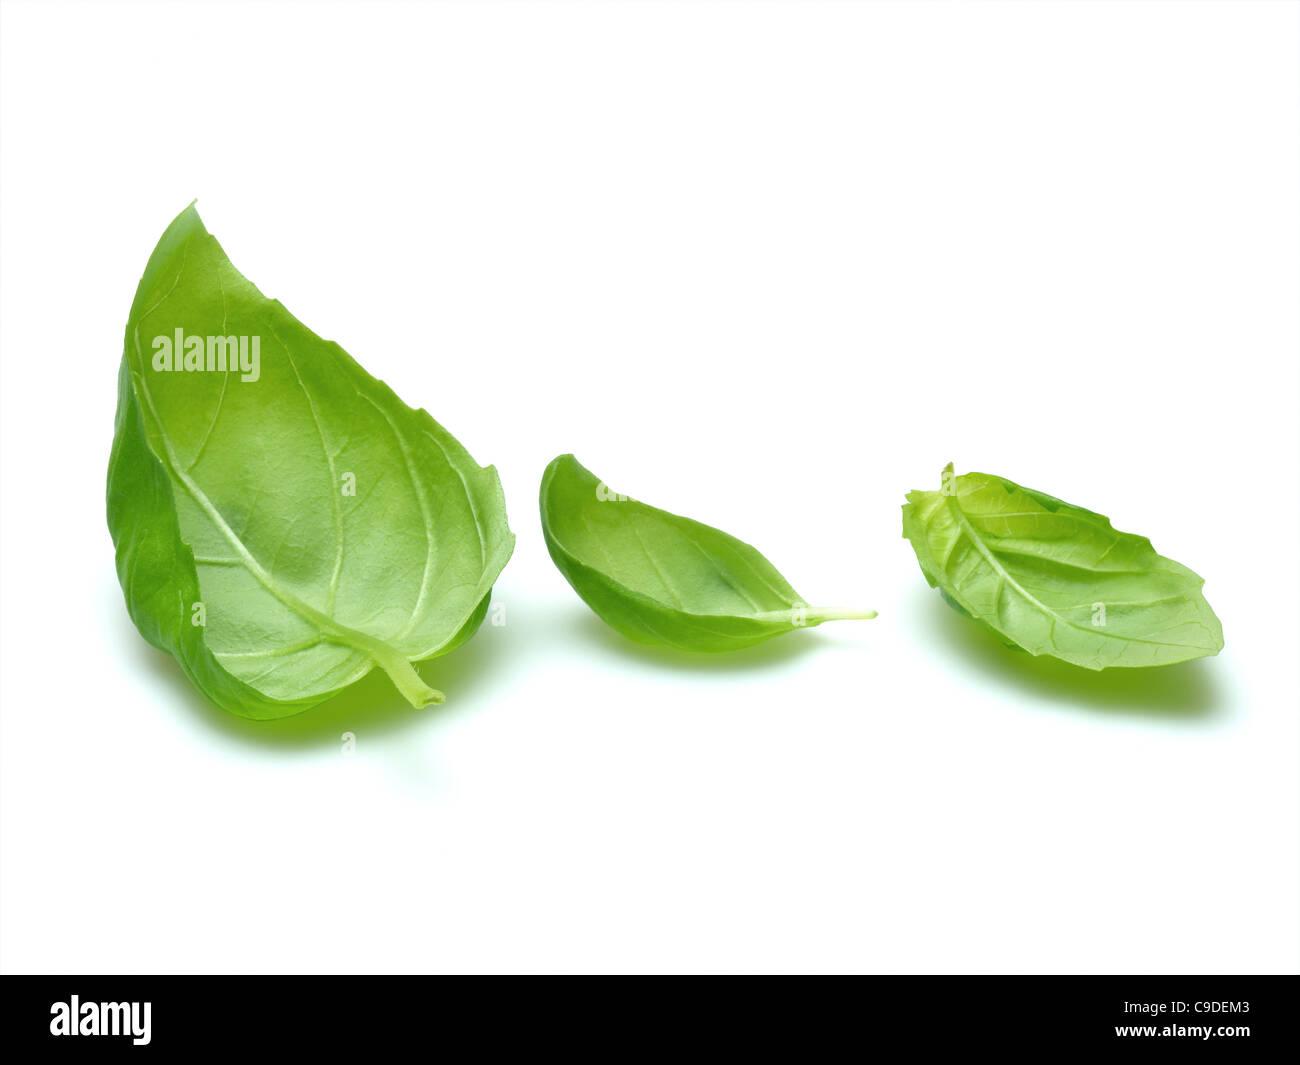 basil leaves - Stock Image